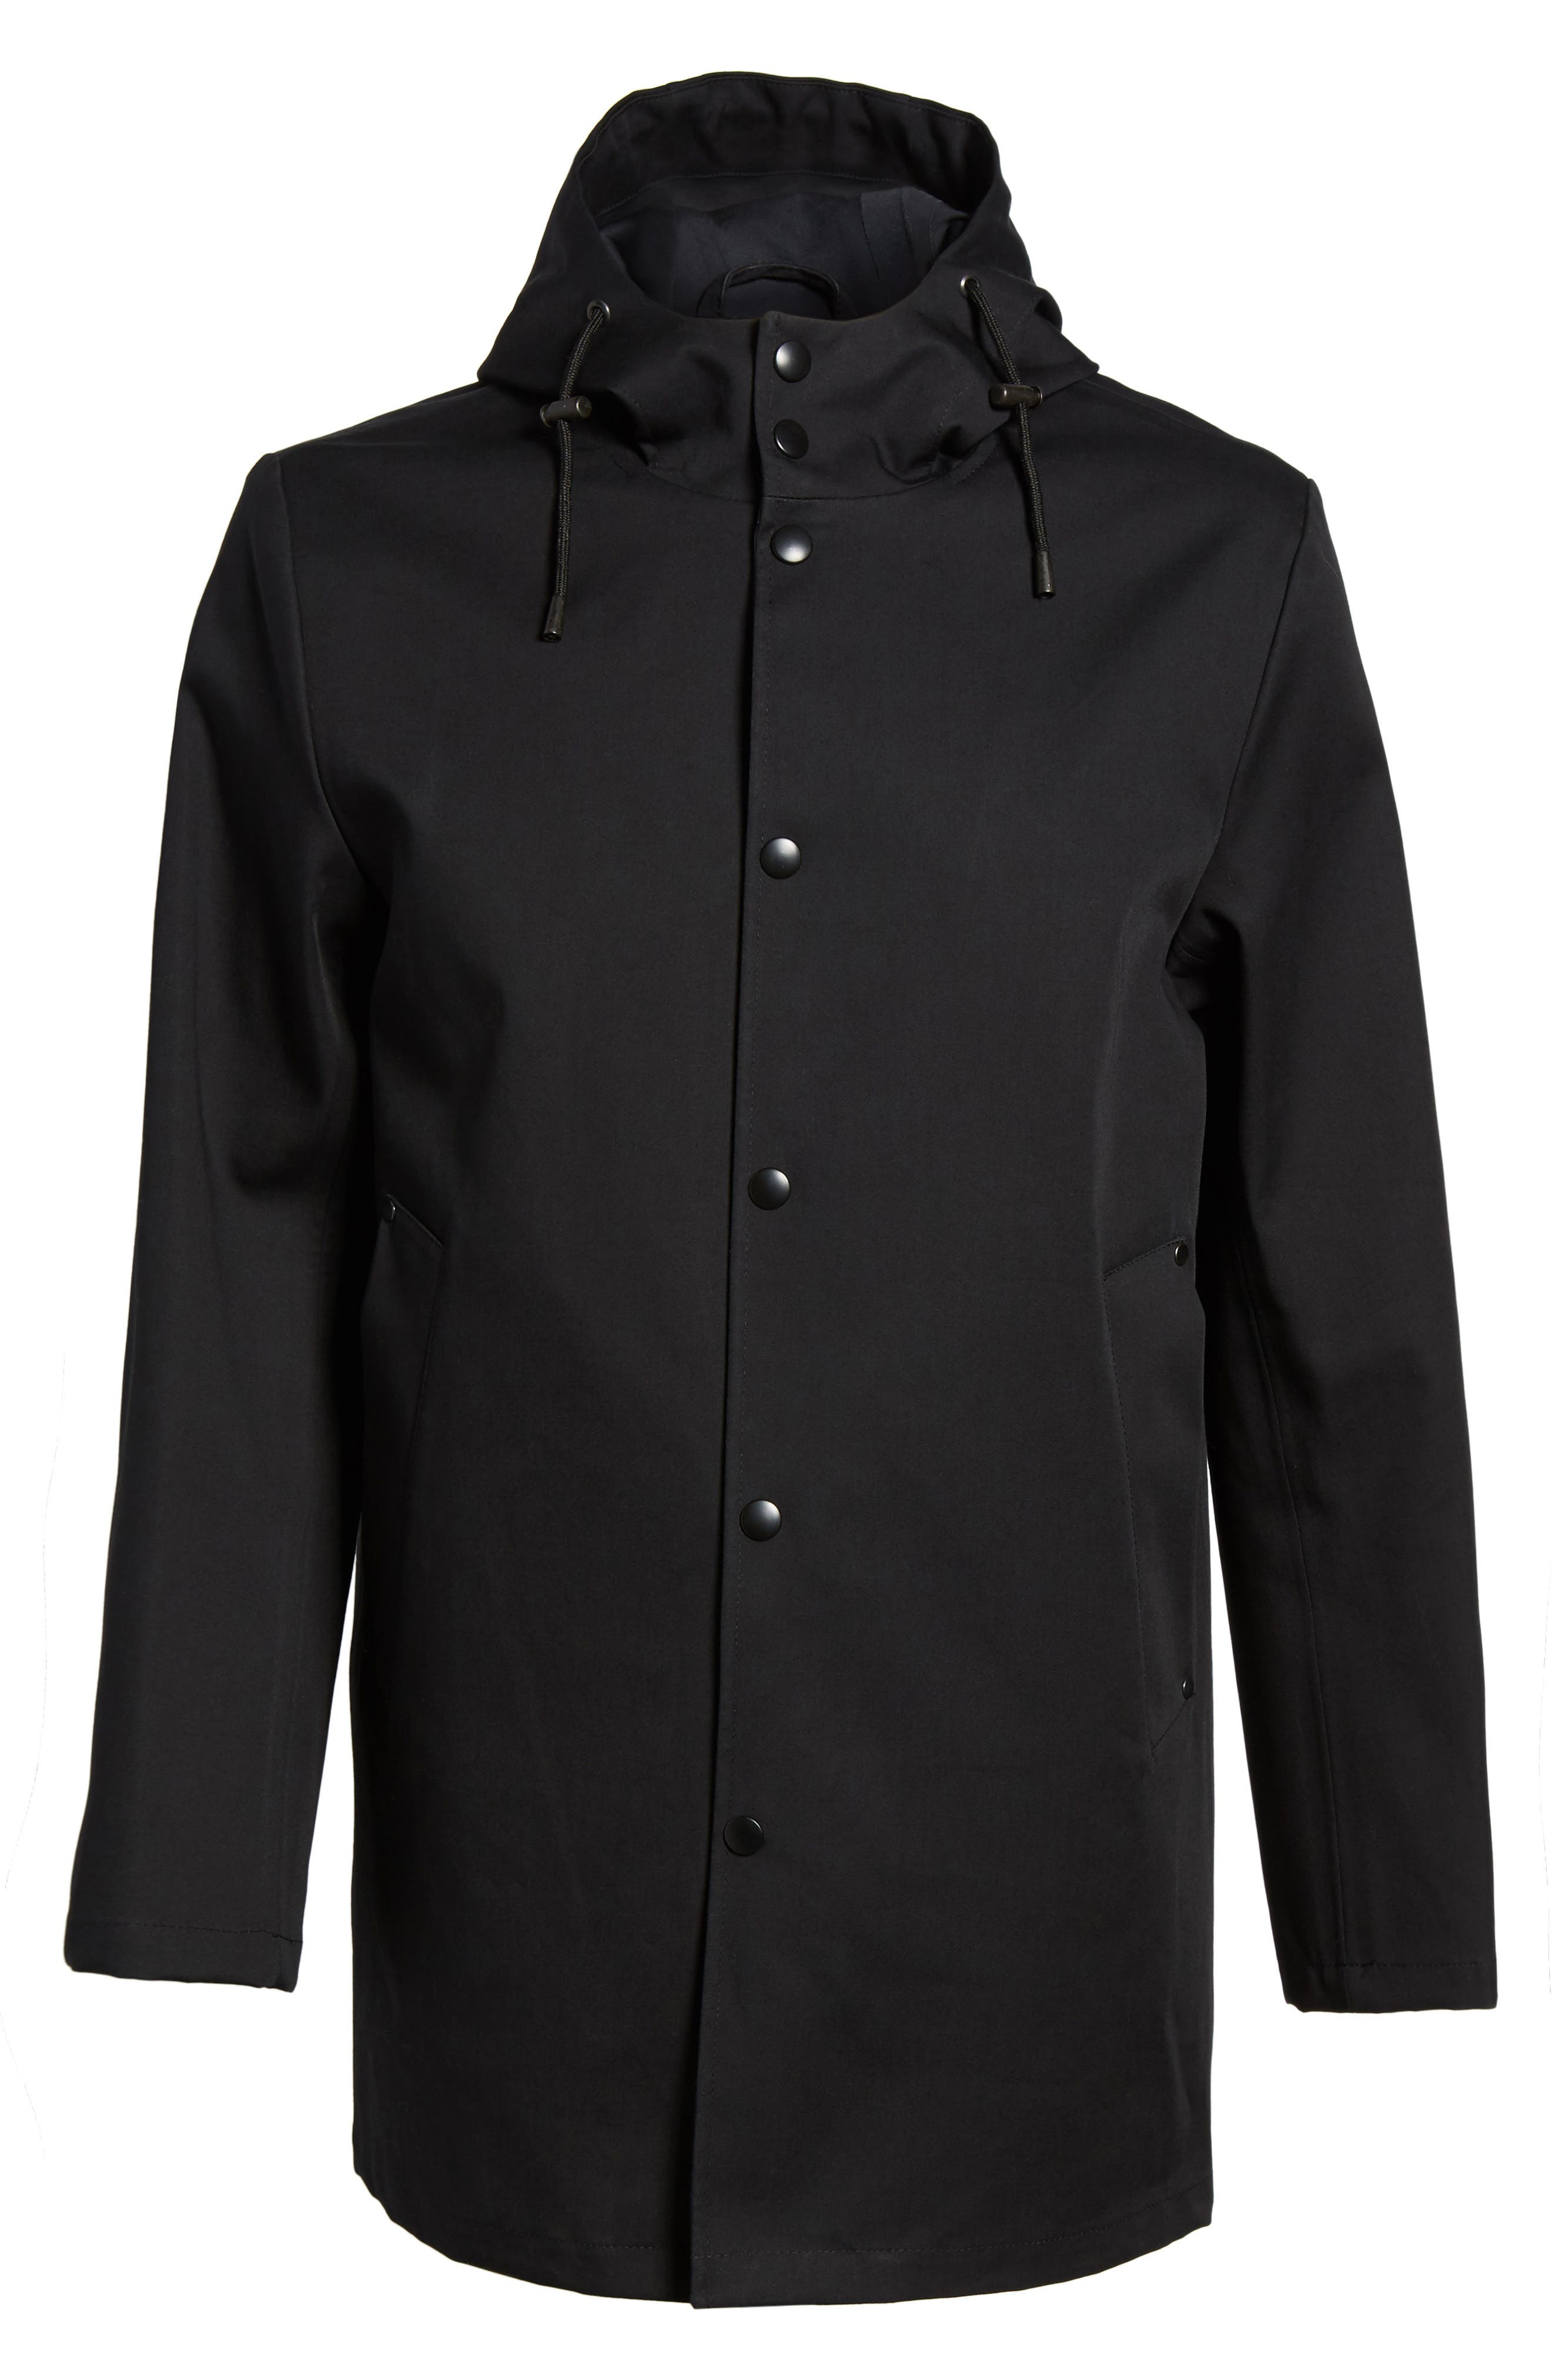 Stockholm Bonded Waterproof Hooded Raincoat,                             Alternate thumbnail 5, color,                             001